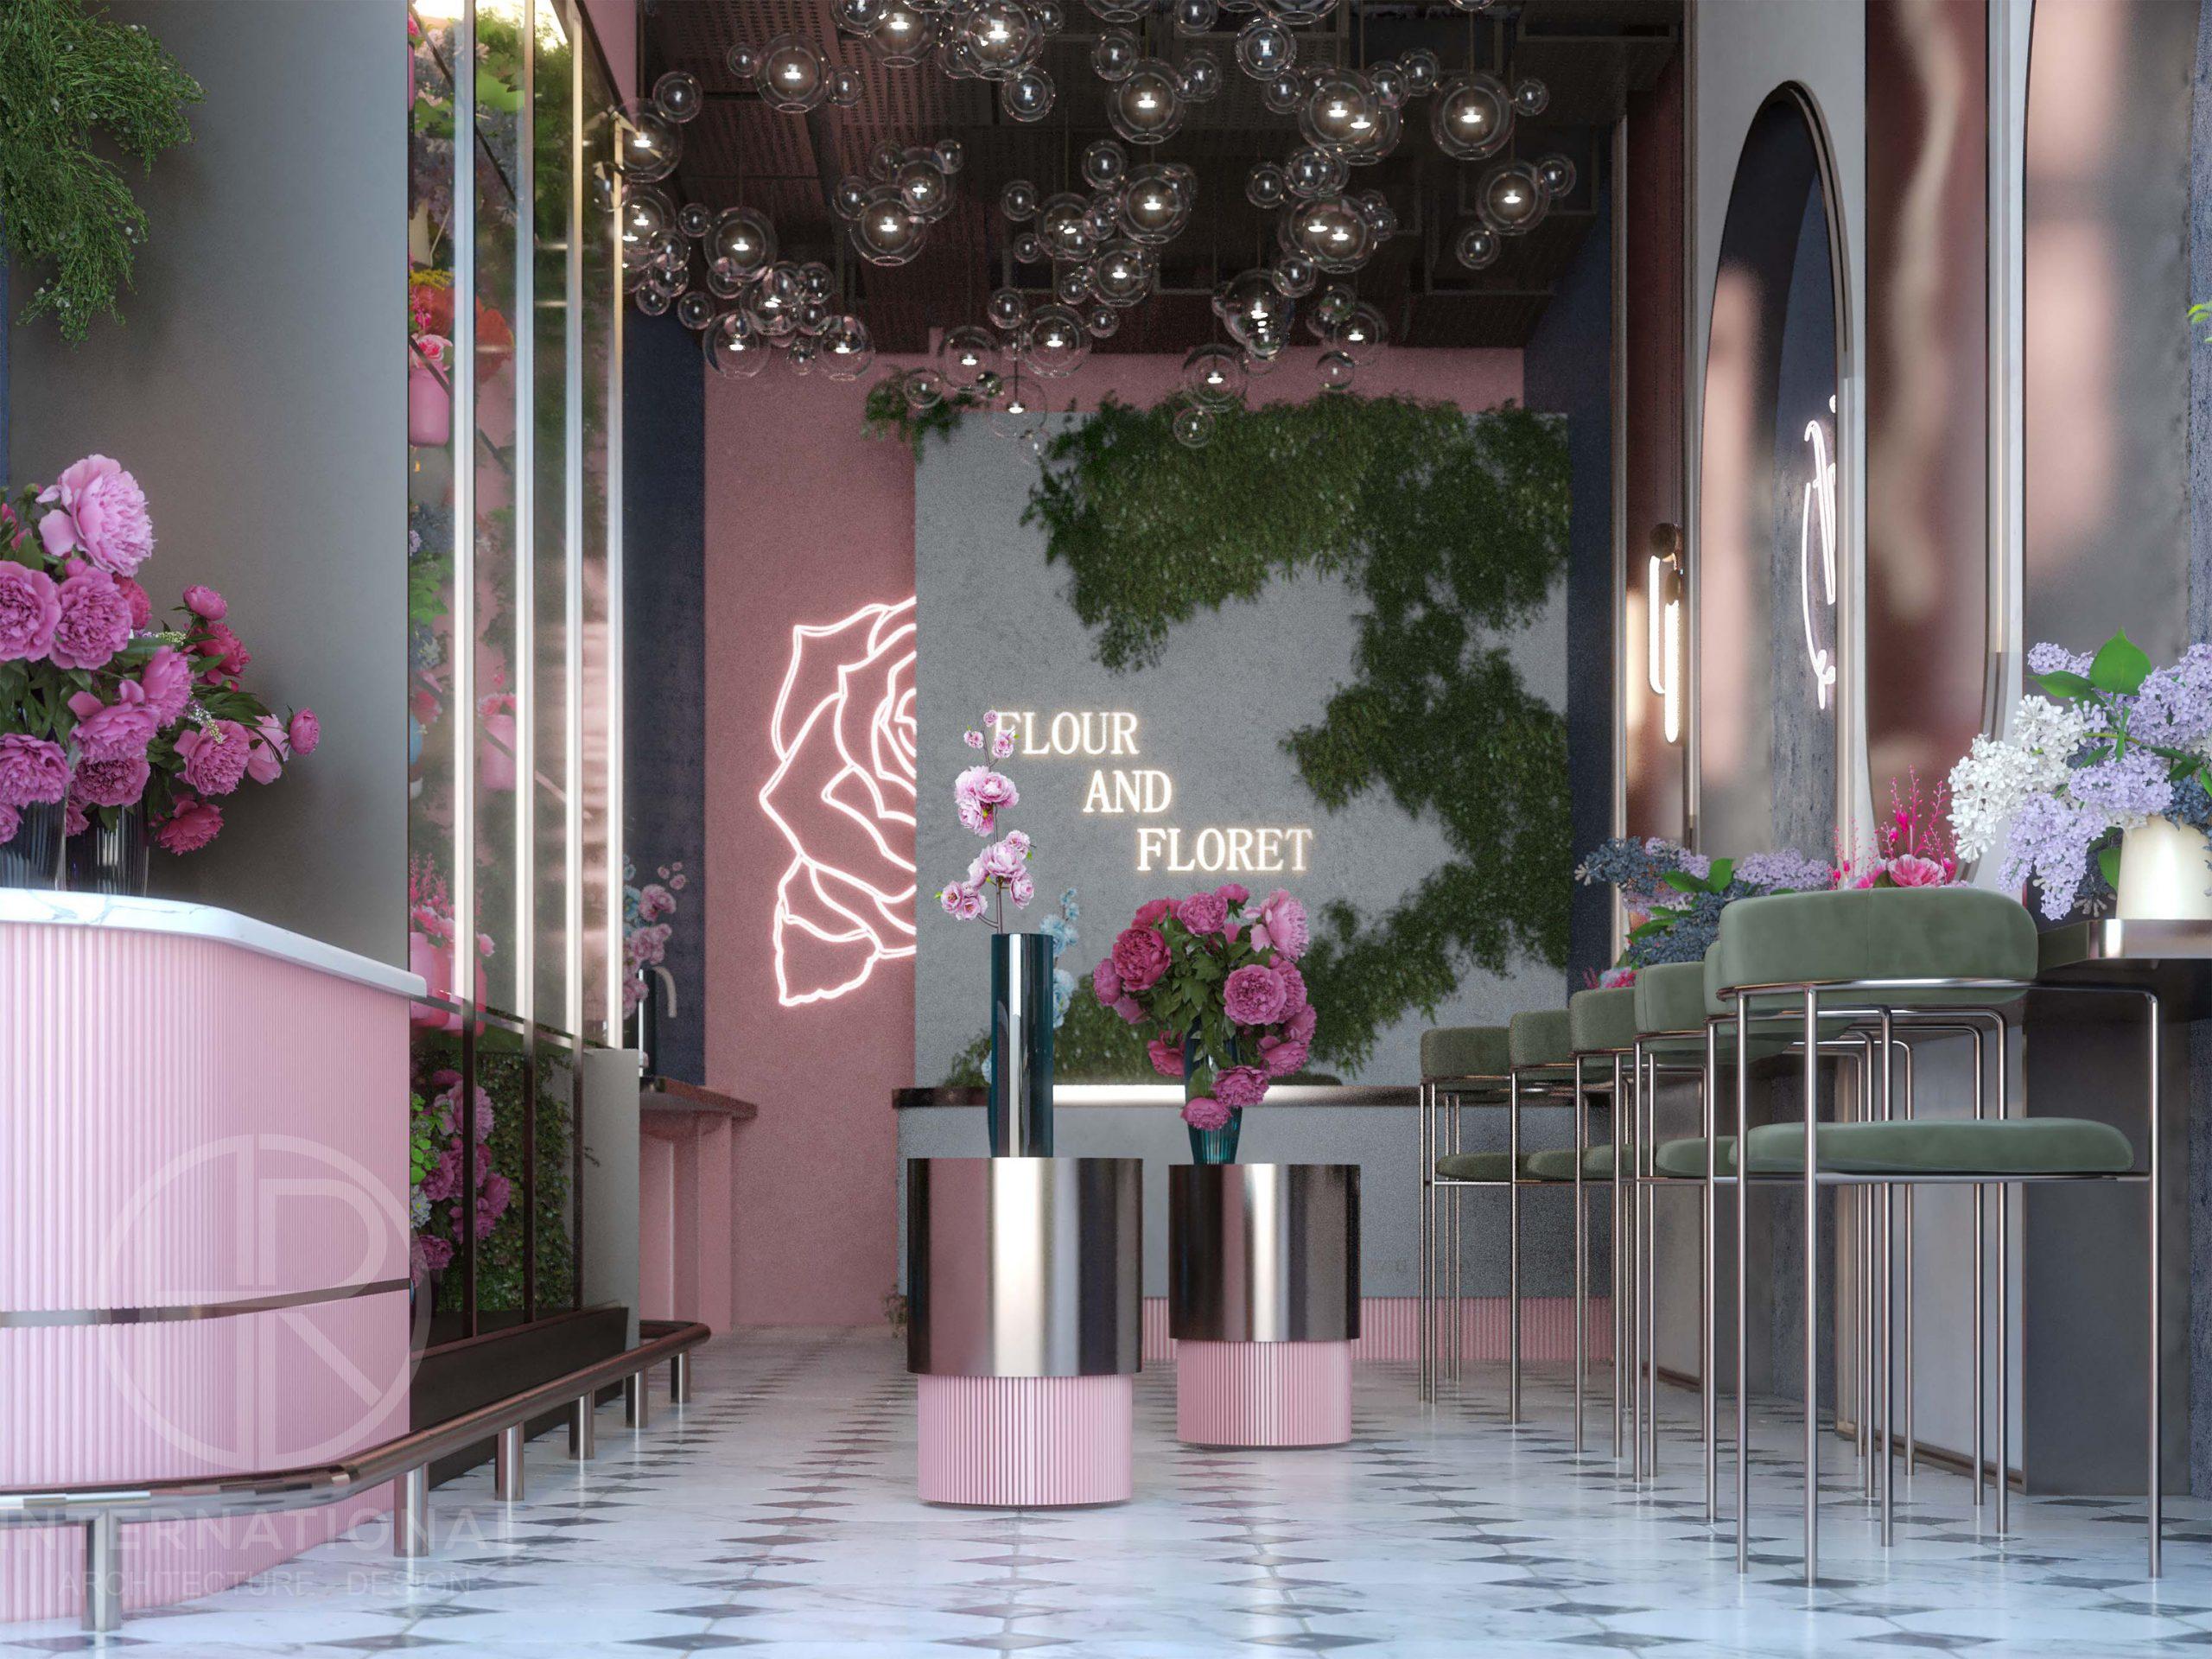 FLOWERS SHOP DESIGN - flower design - FLOWERS SHOP - pink